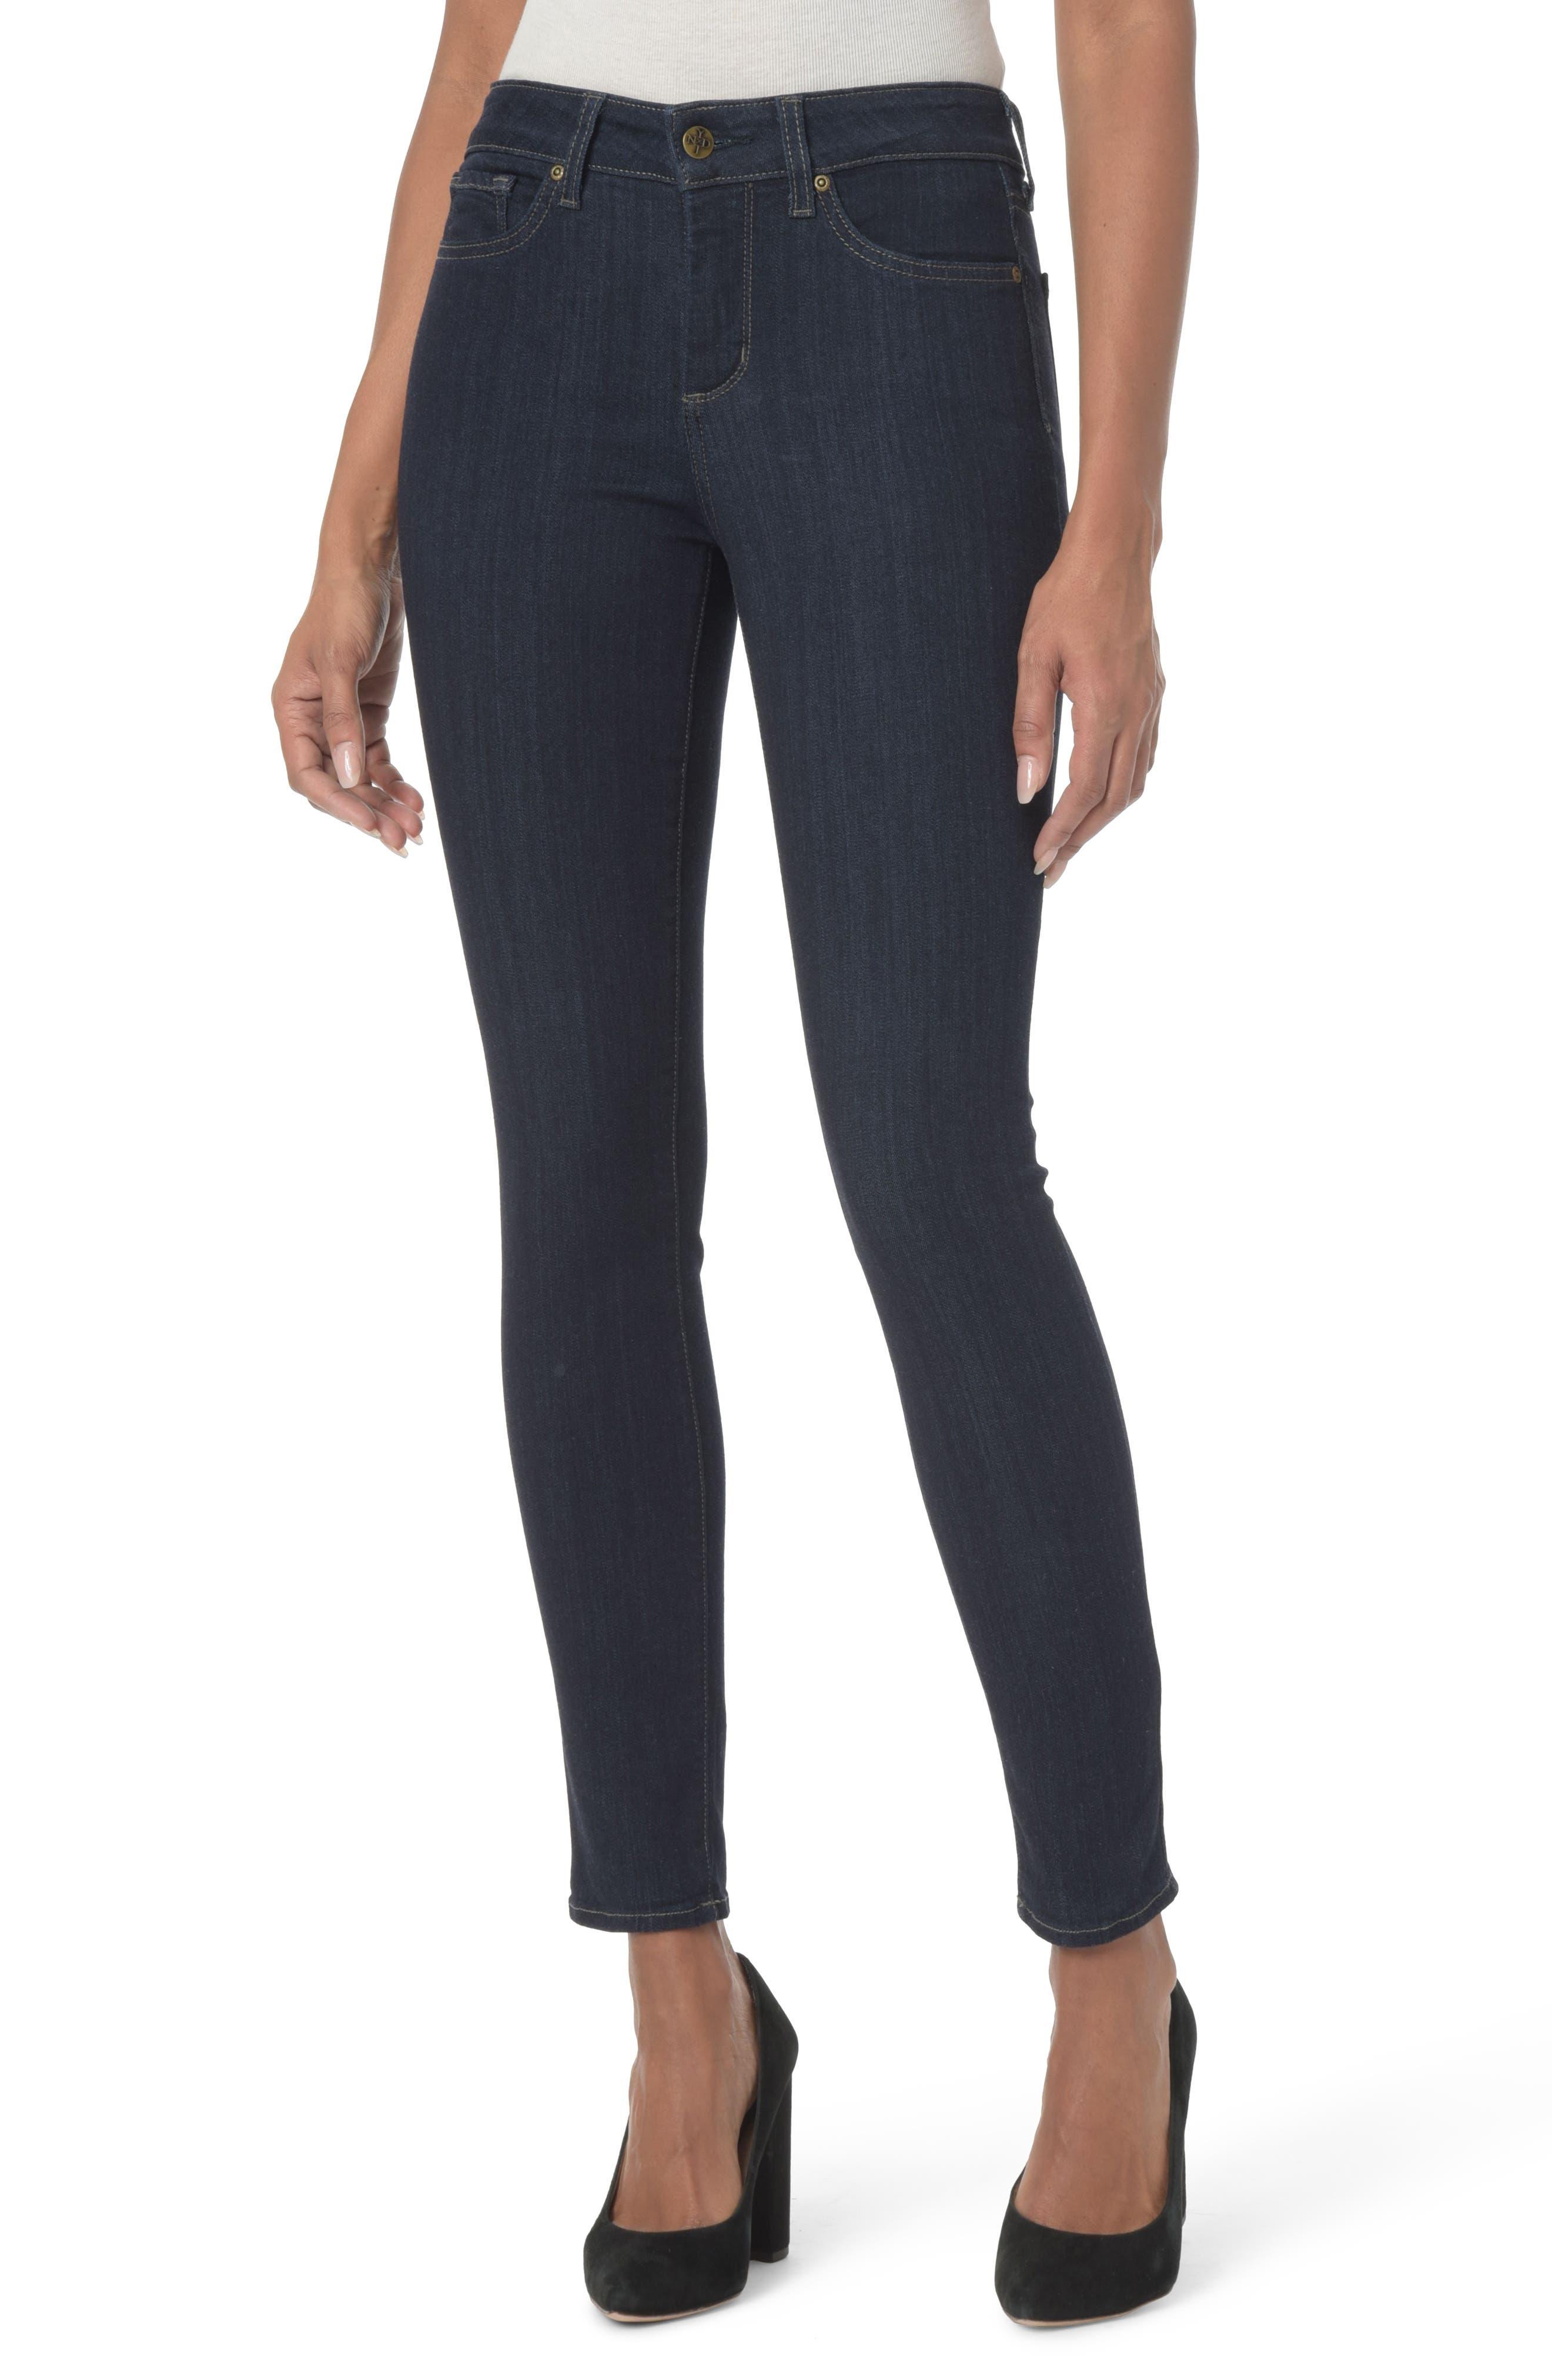 Alternate Image 1 Selected - NYDJ Ami Stretch Super Skinny Jeans (Regular & Petite)